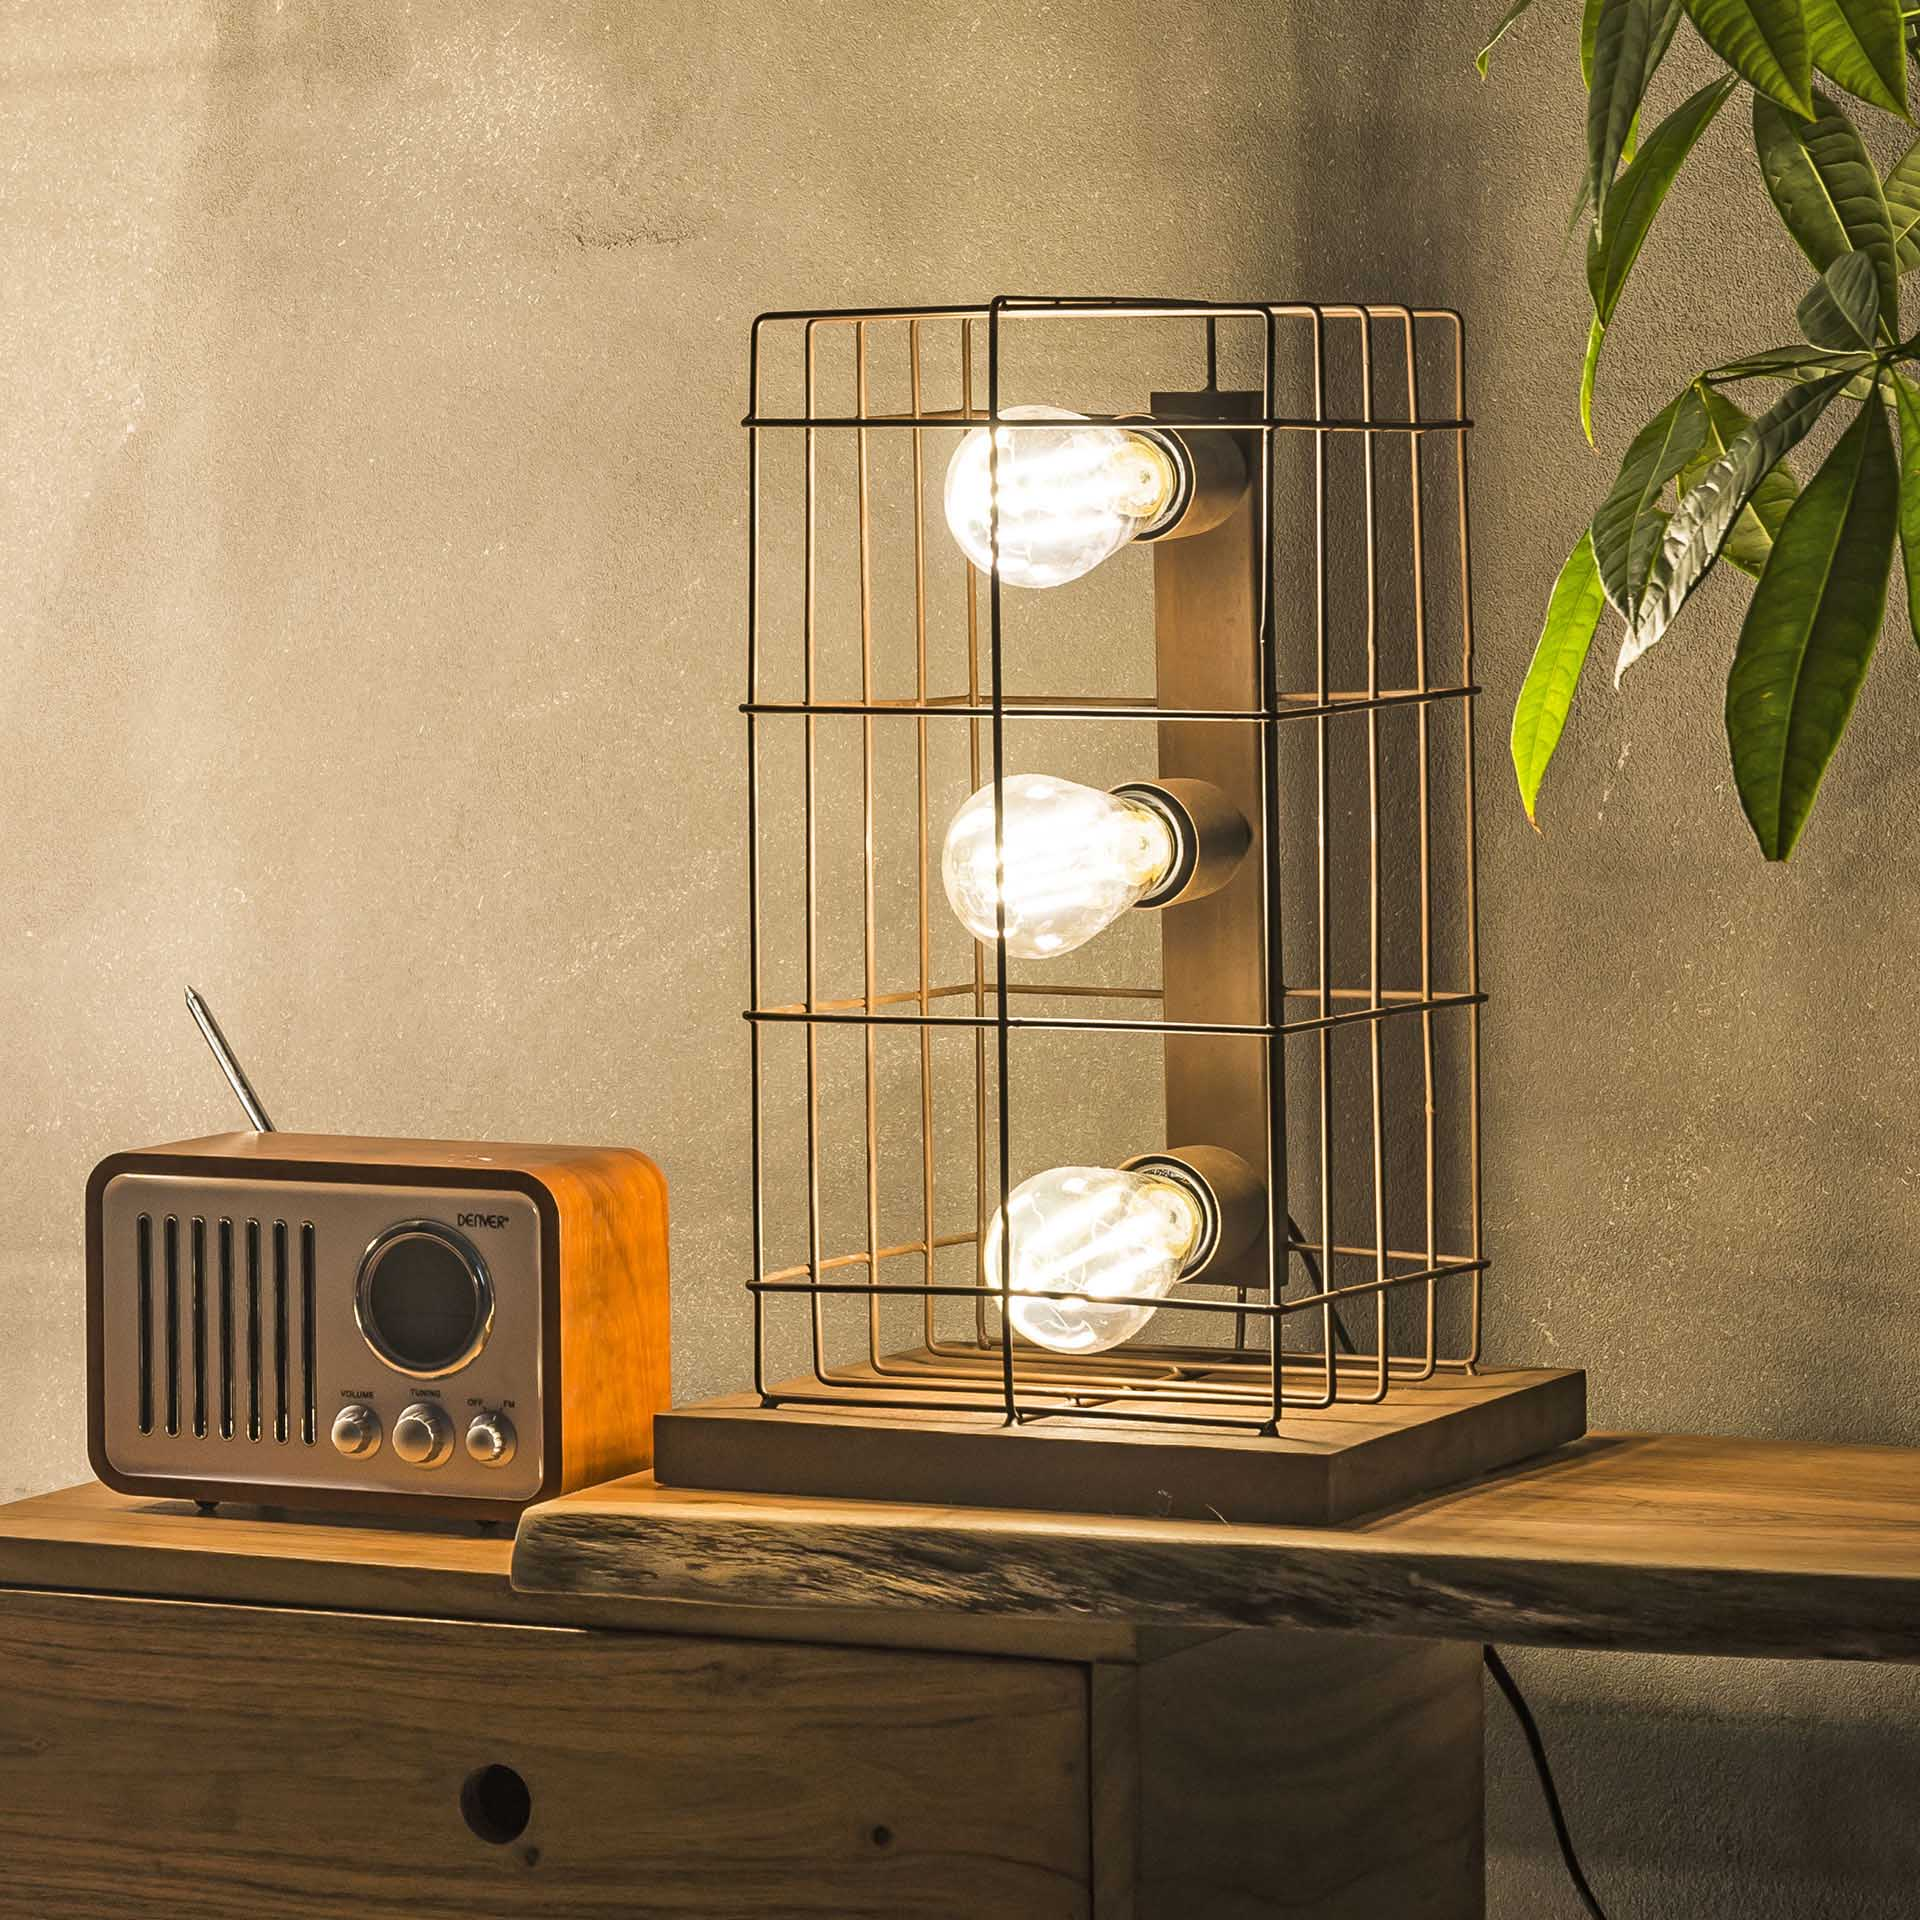 Tafellamp 'Ayhan' Kooi 3-lamps, roestbruin Verlichting | Tafellampen kopen